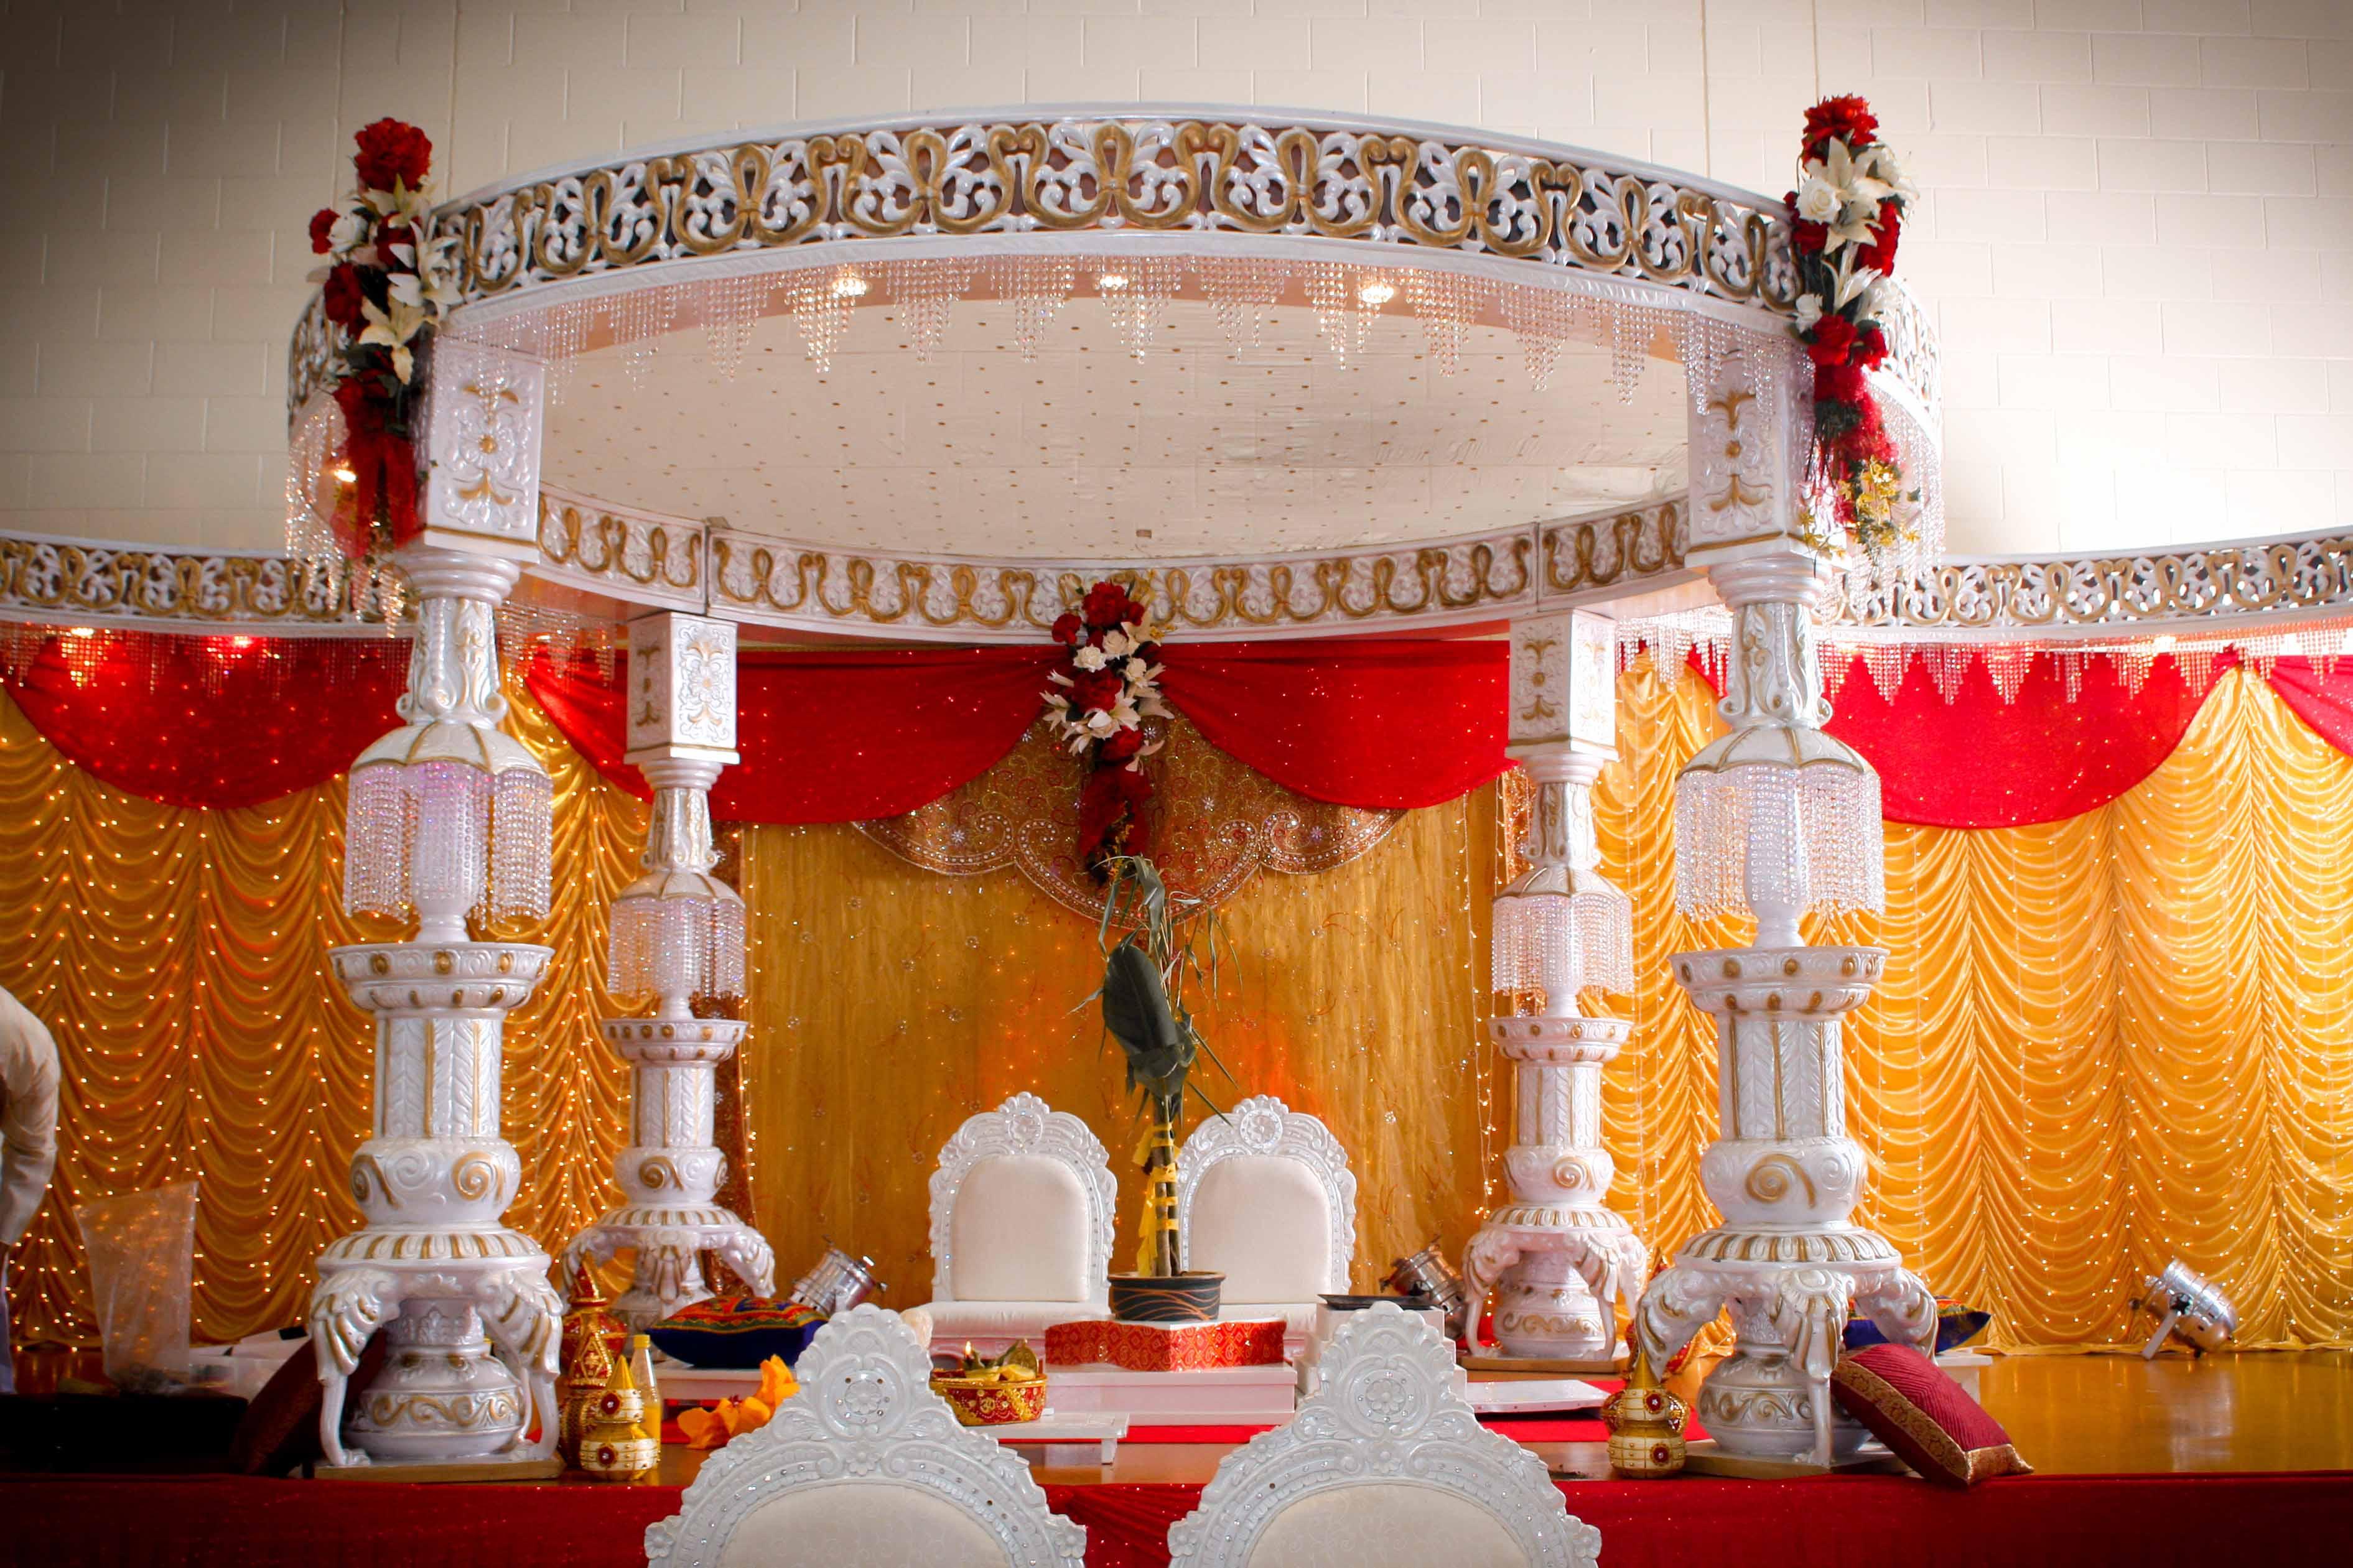 wedding chair hire hamilton nz majestic home goods bean bag review decorations romantic decoration